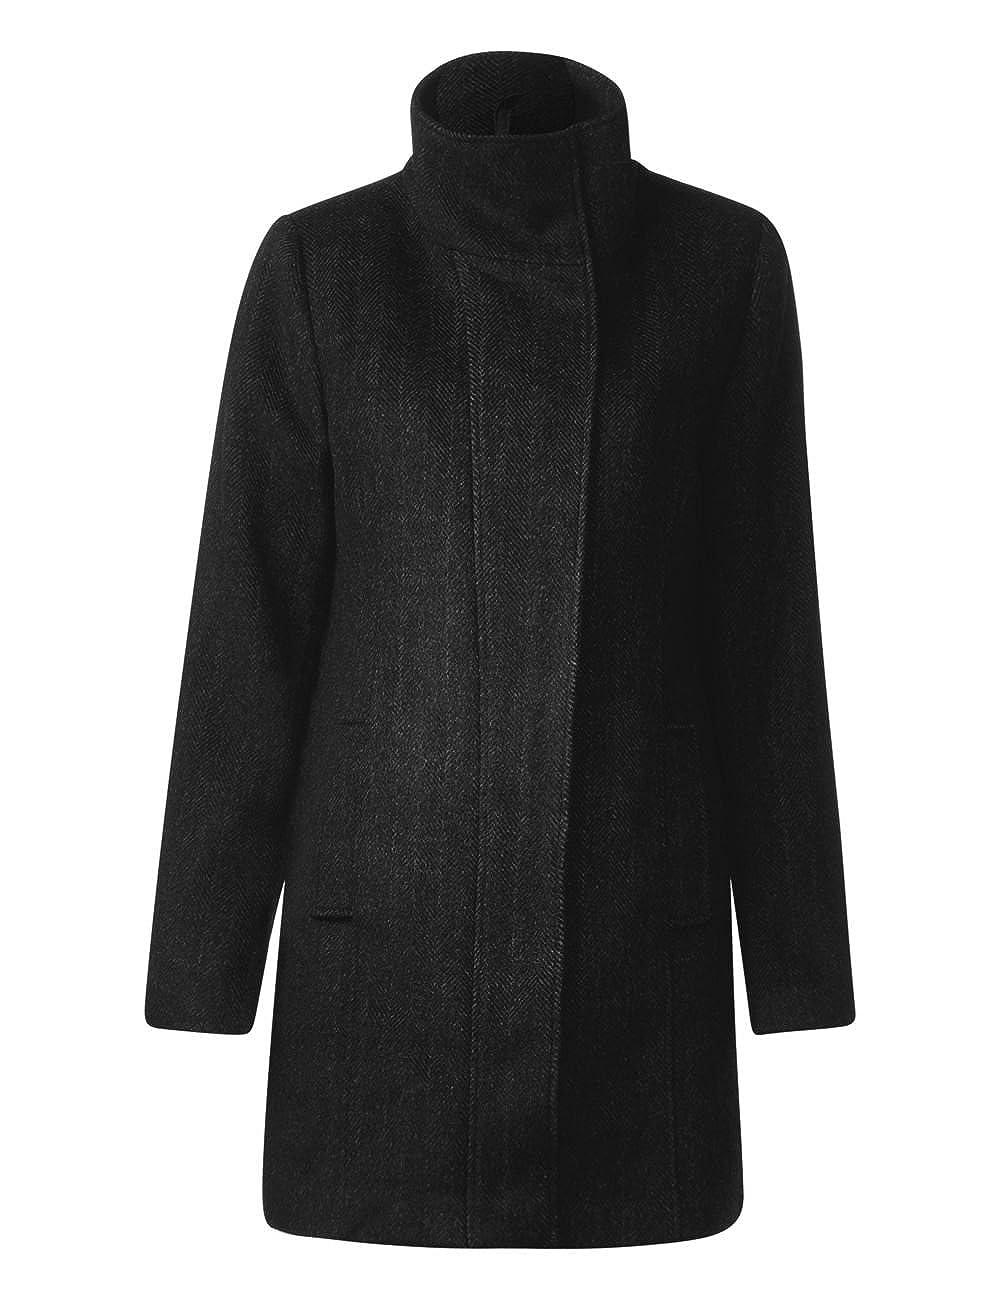 taglia Donna Giubbotto 10001 black serena Melange Ojp One Produttore Nero Coat Wool 40 46 Street ZvH8W